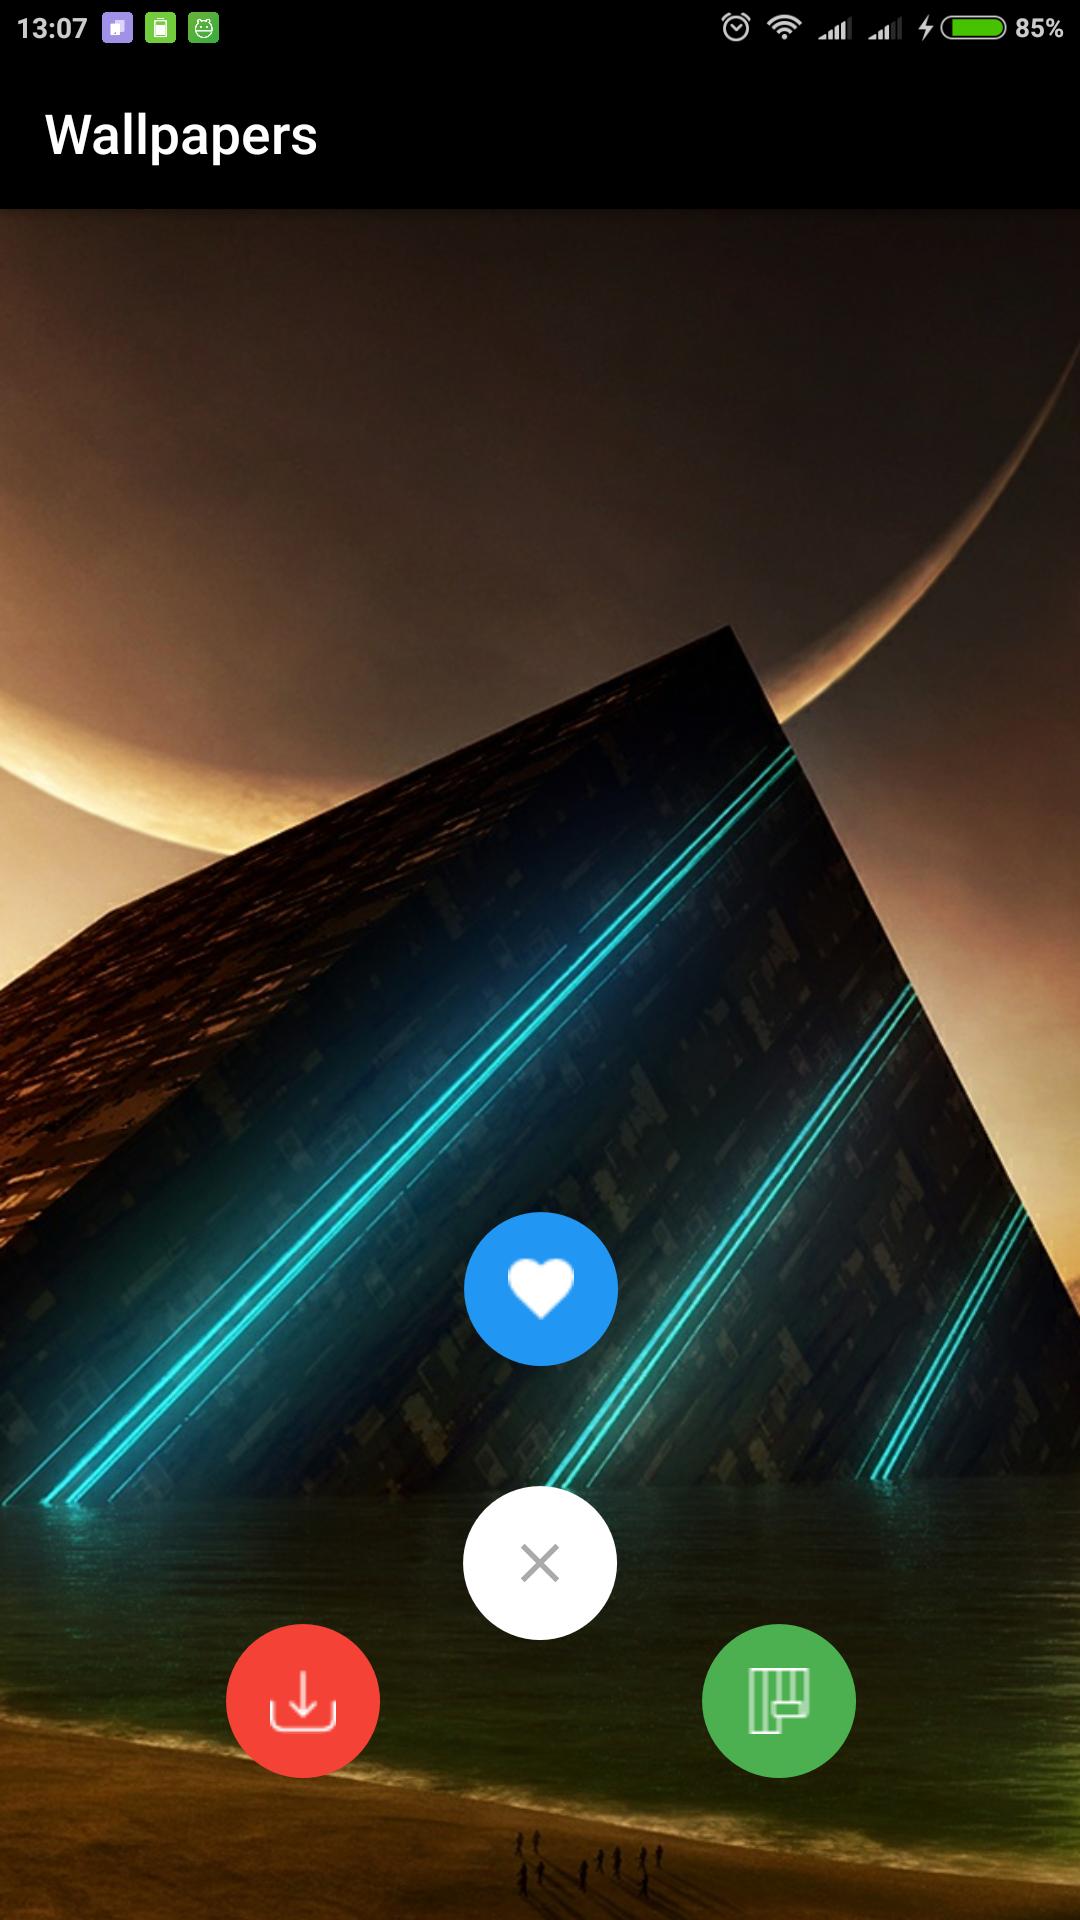 wallpaper retina android